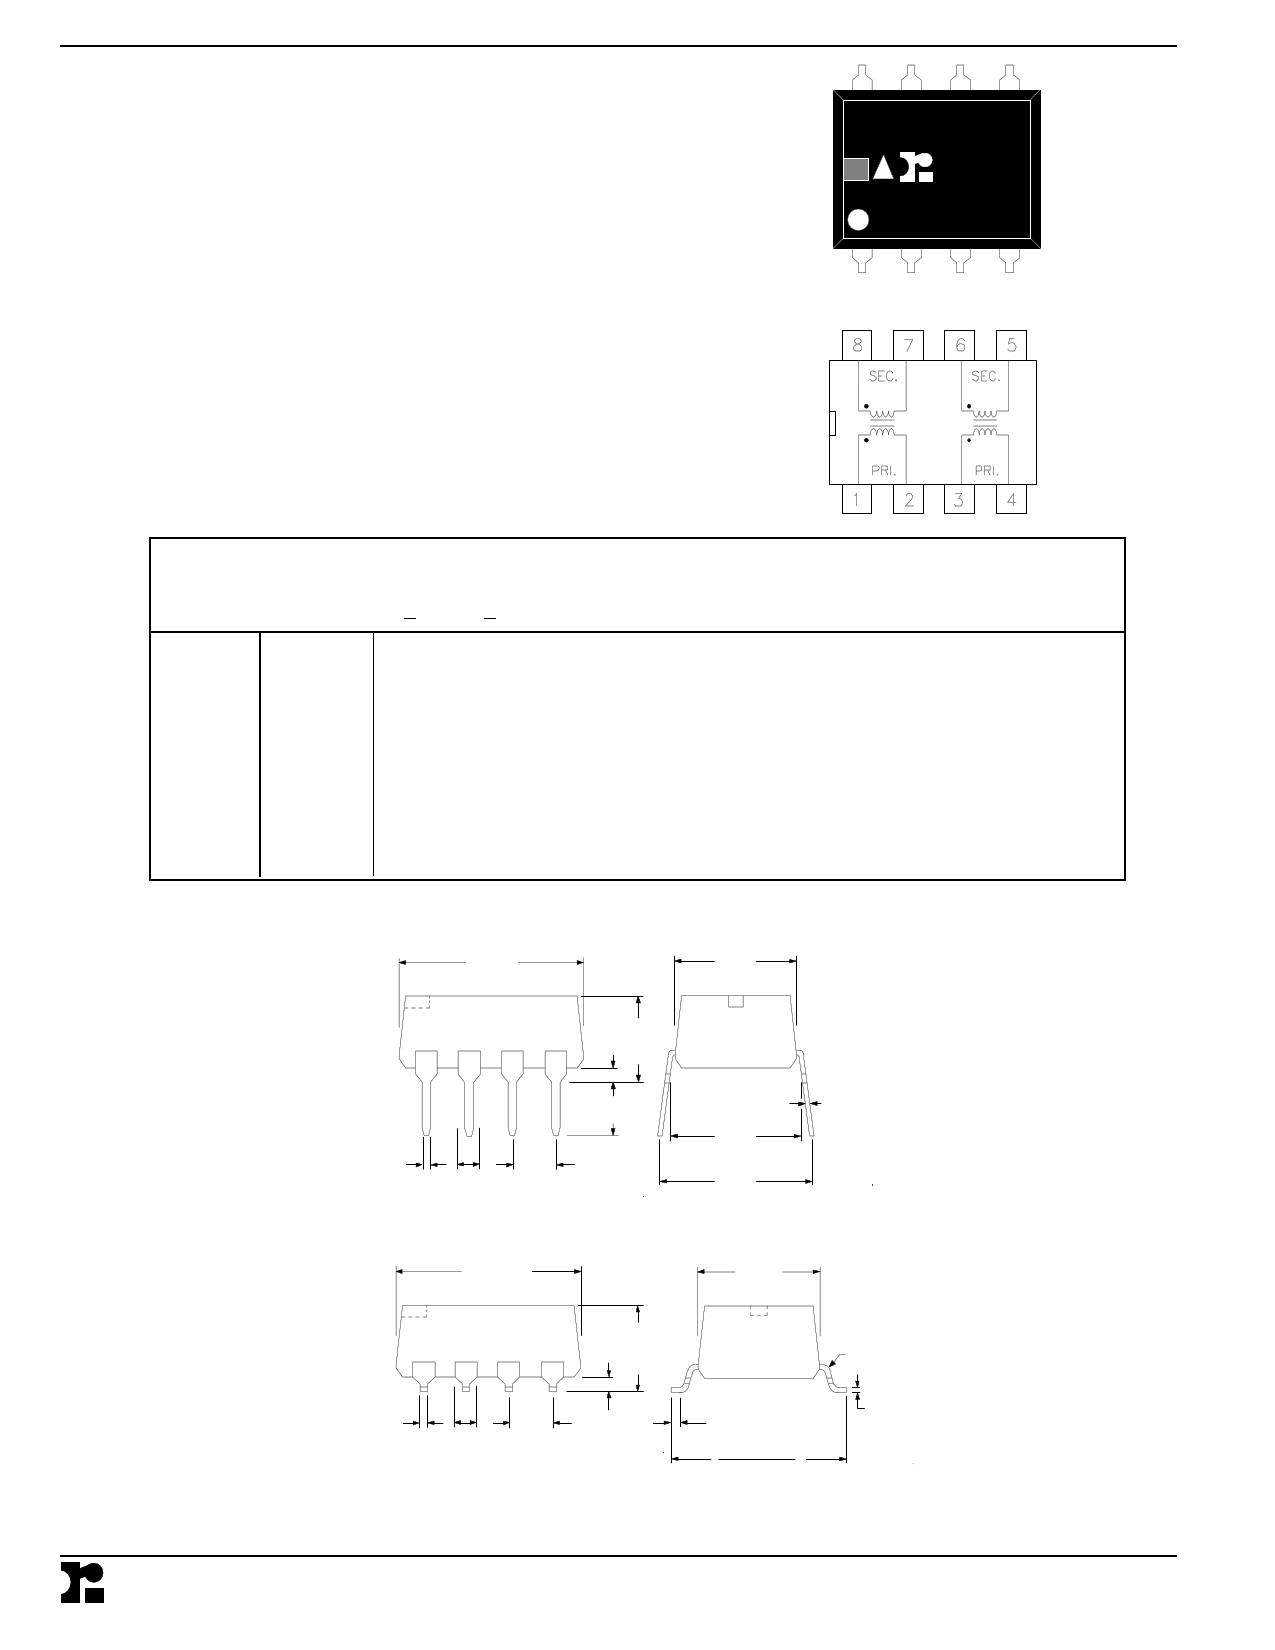 T-11301 datasheet